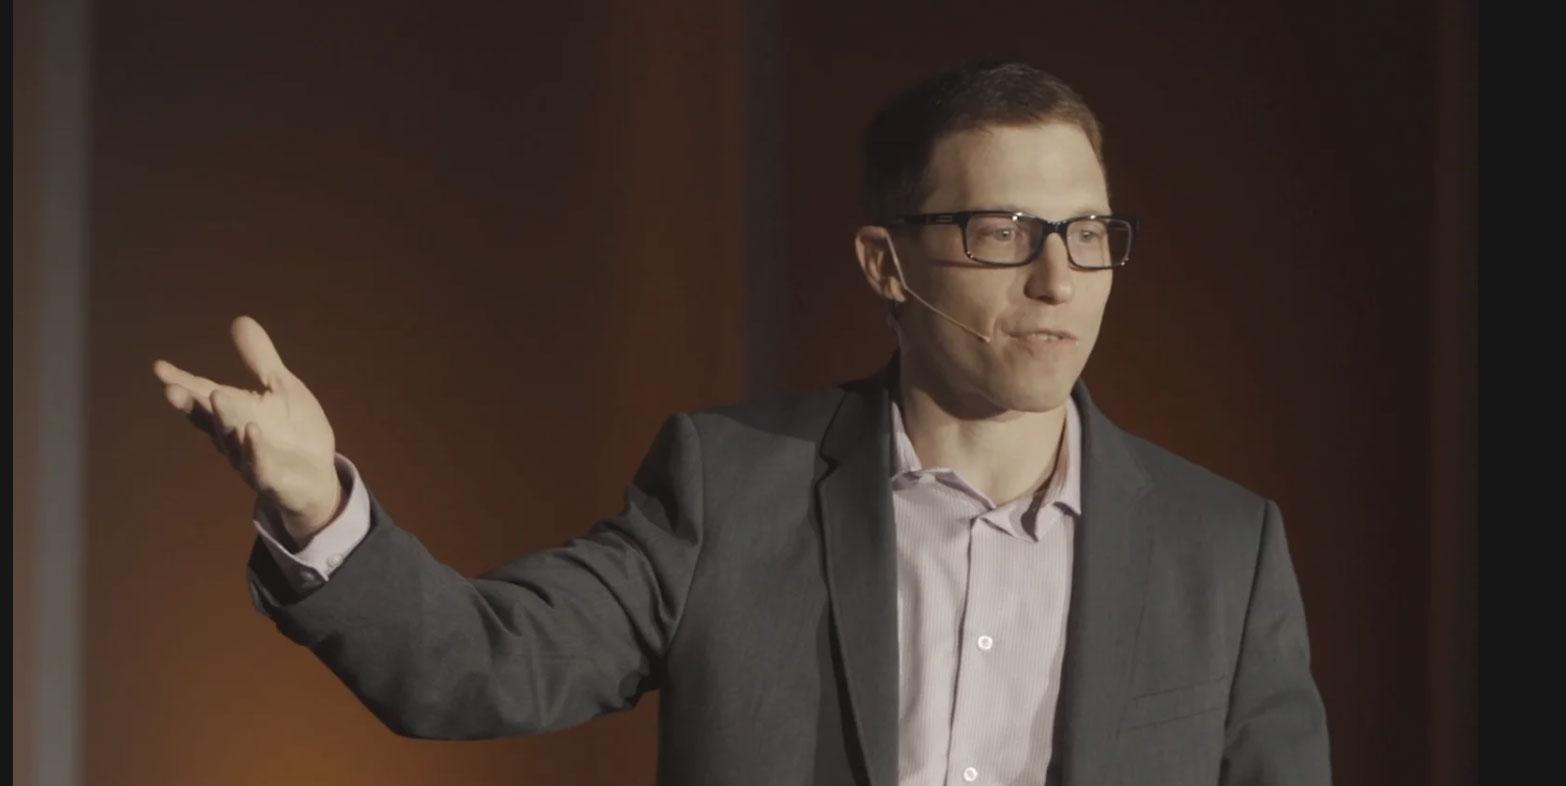 FIBA-Innovation Fusion 2018-Oren Kedem, Co-Founder of Intervyo, virtual interviews